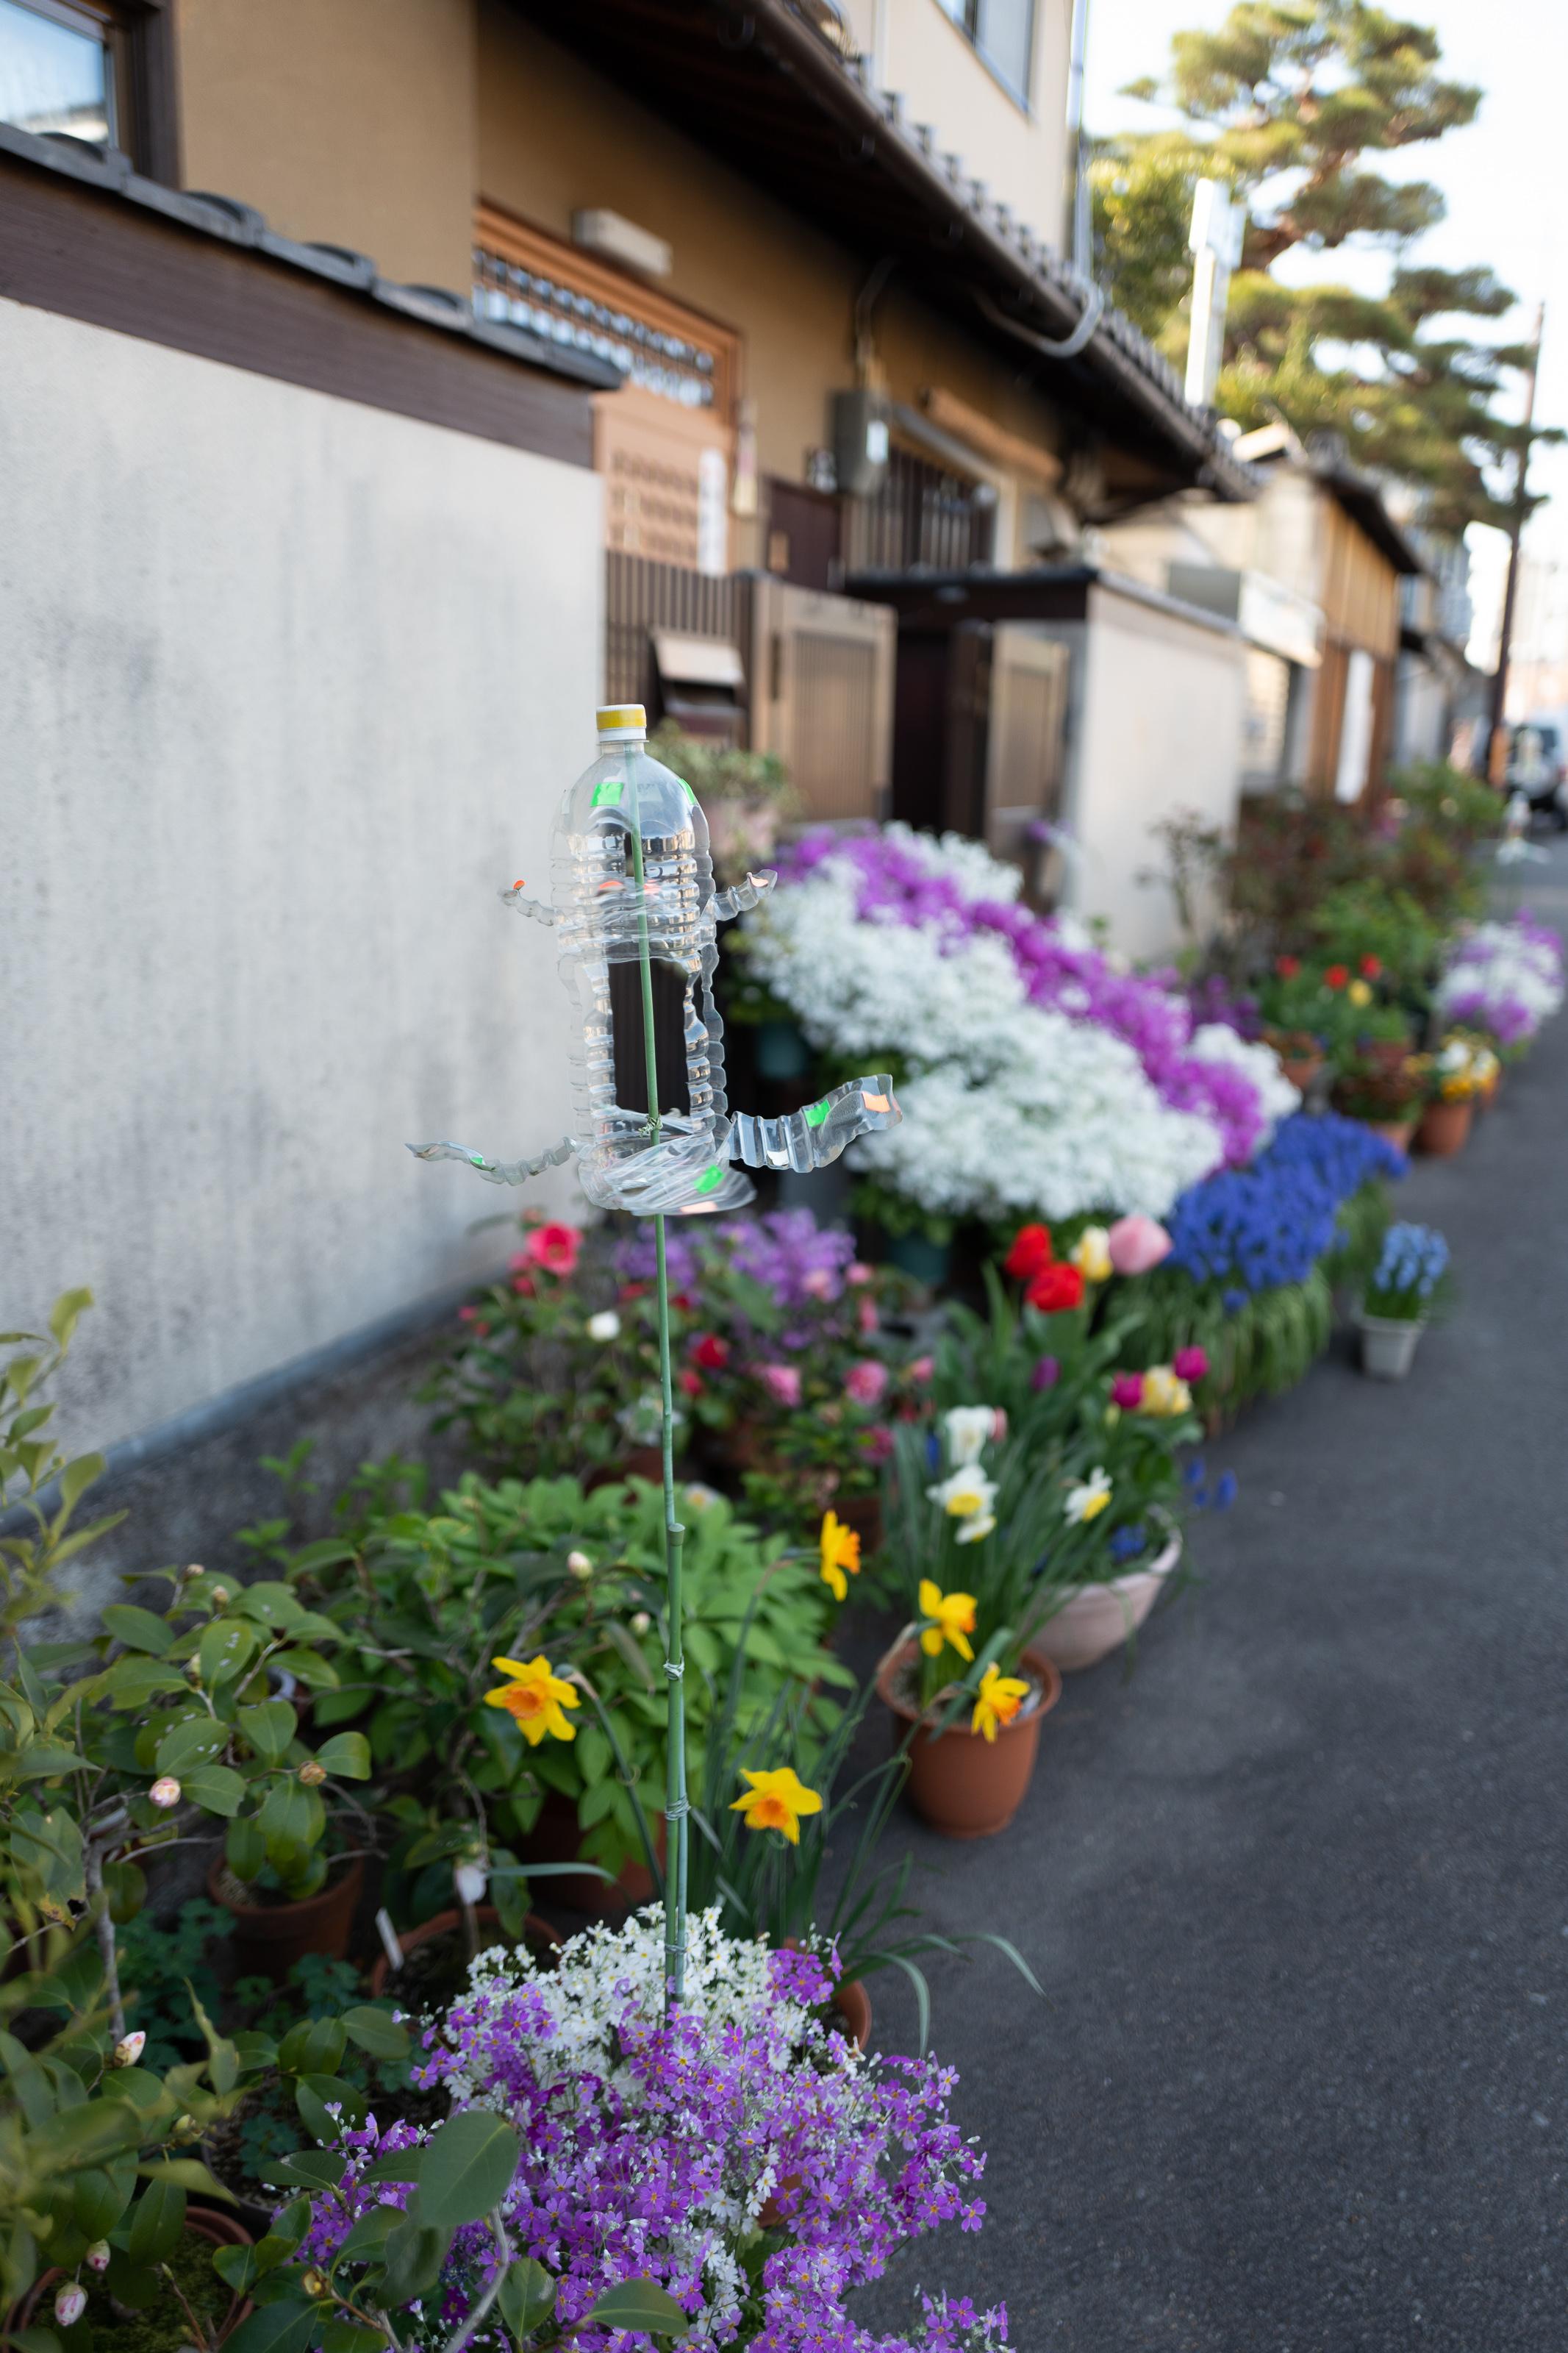 Flowers on the way to the Imamiya Shrine